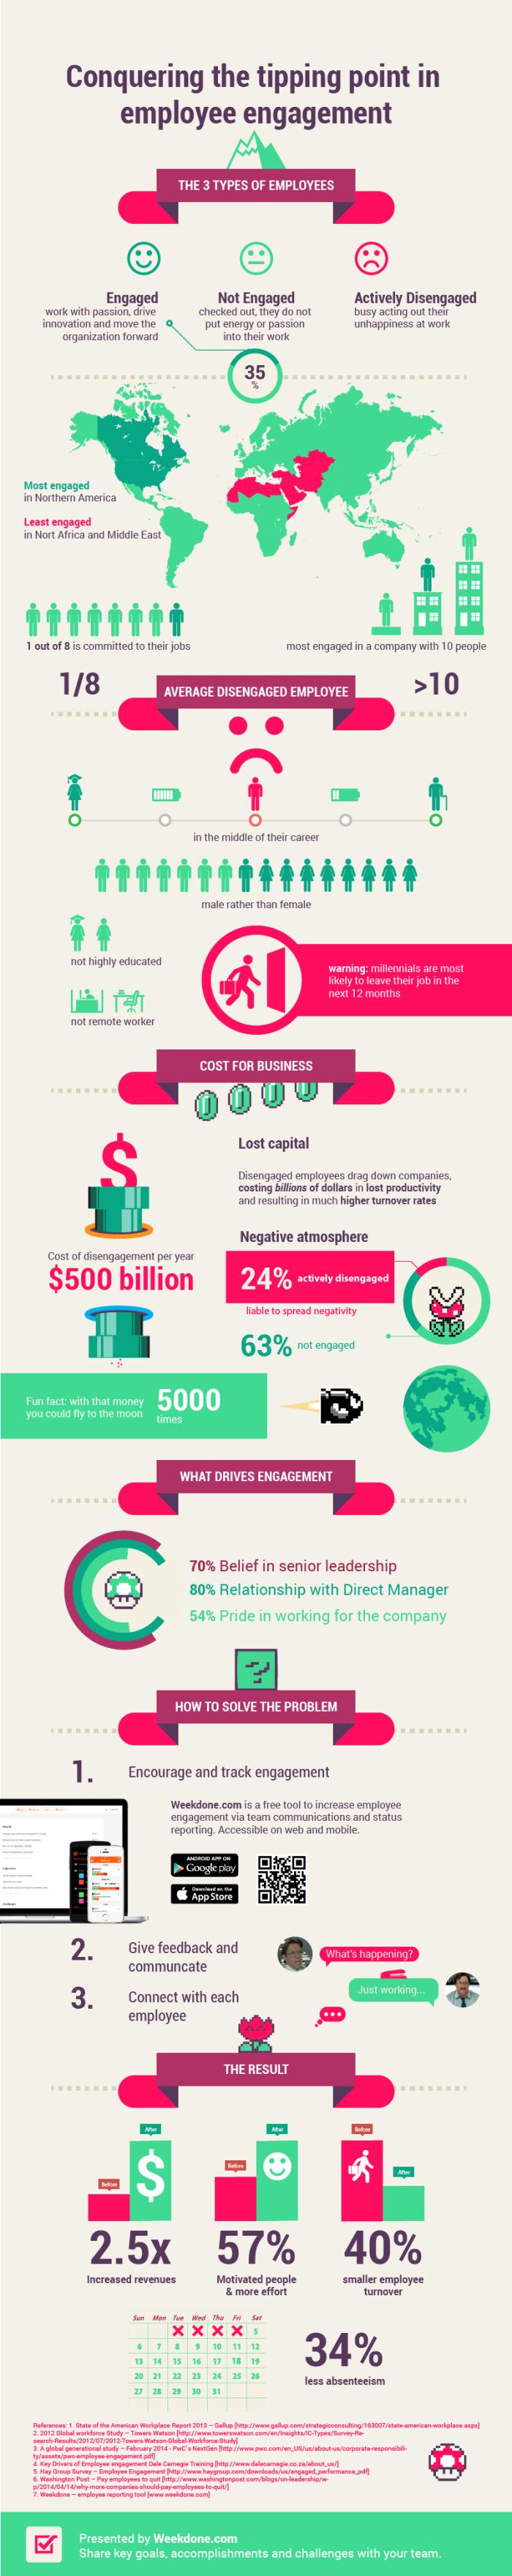 weekdone-employee-engagement-infographic